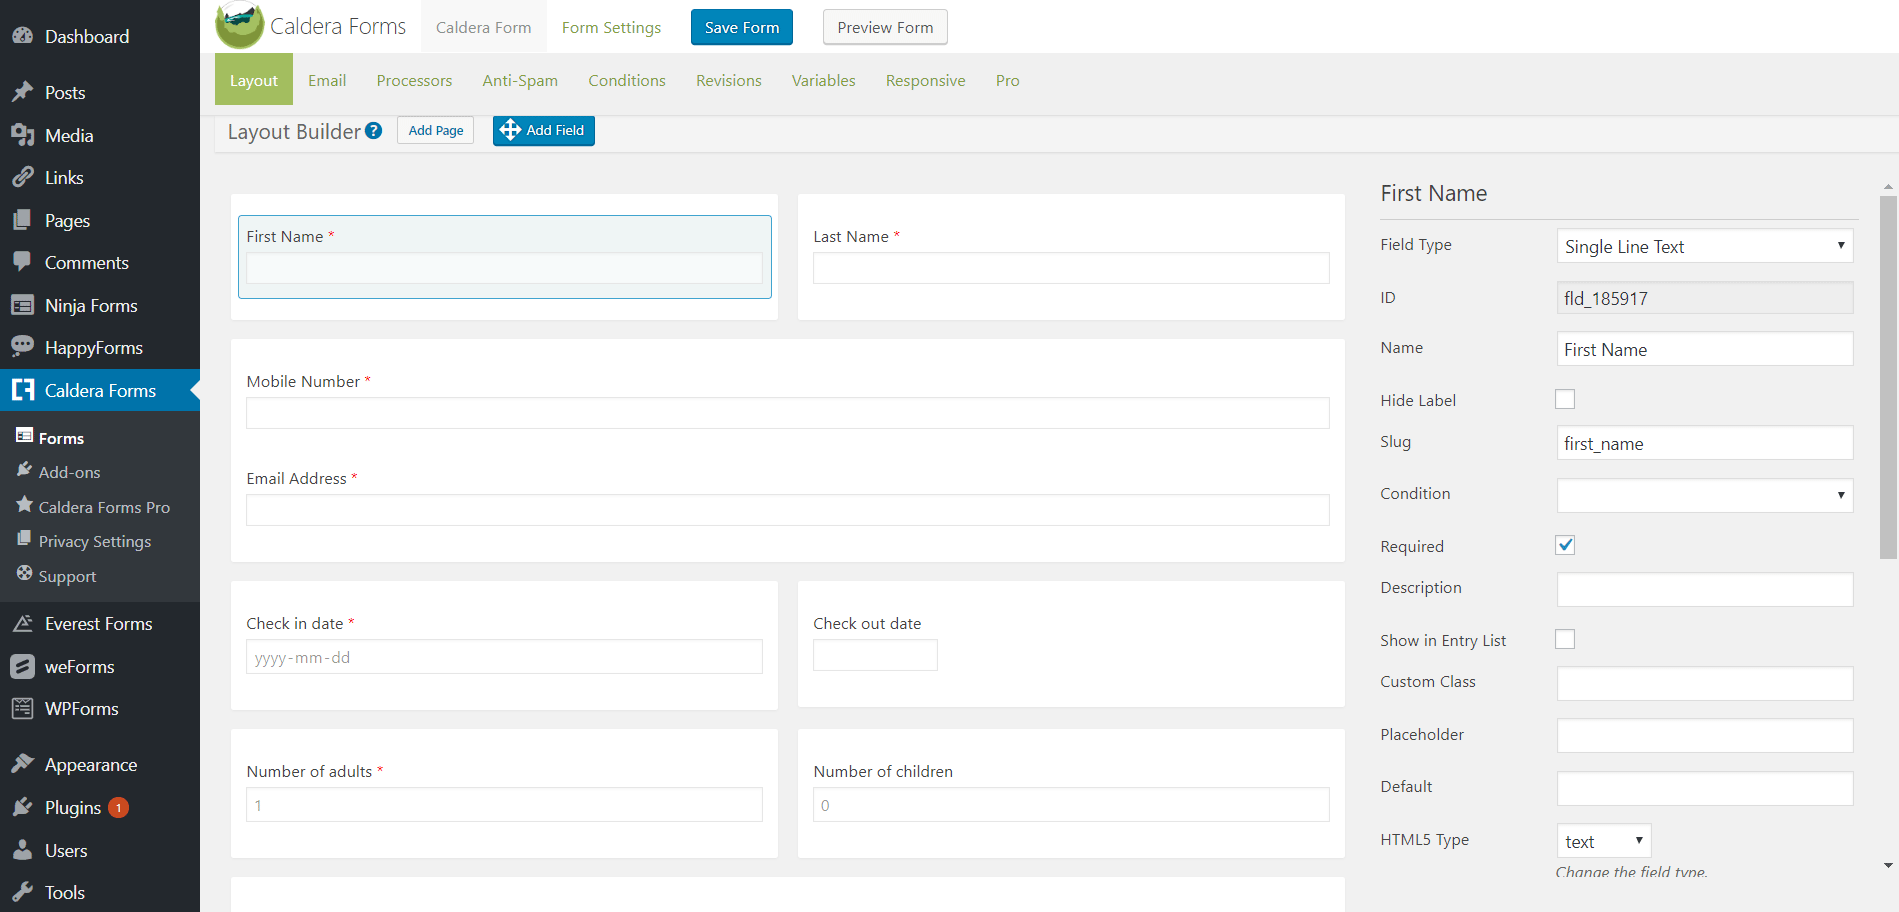 Best WordPress Form Builder Plugins - Caldera Forms